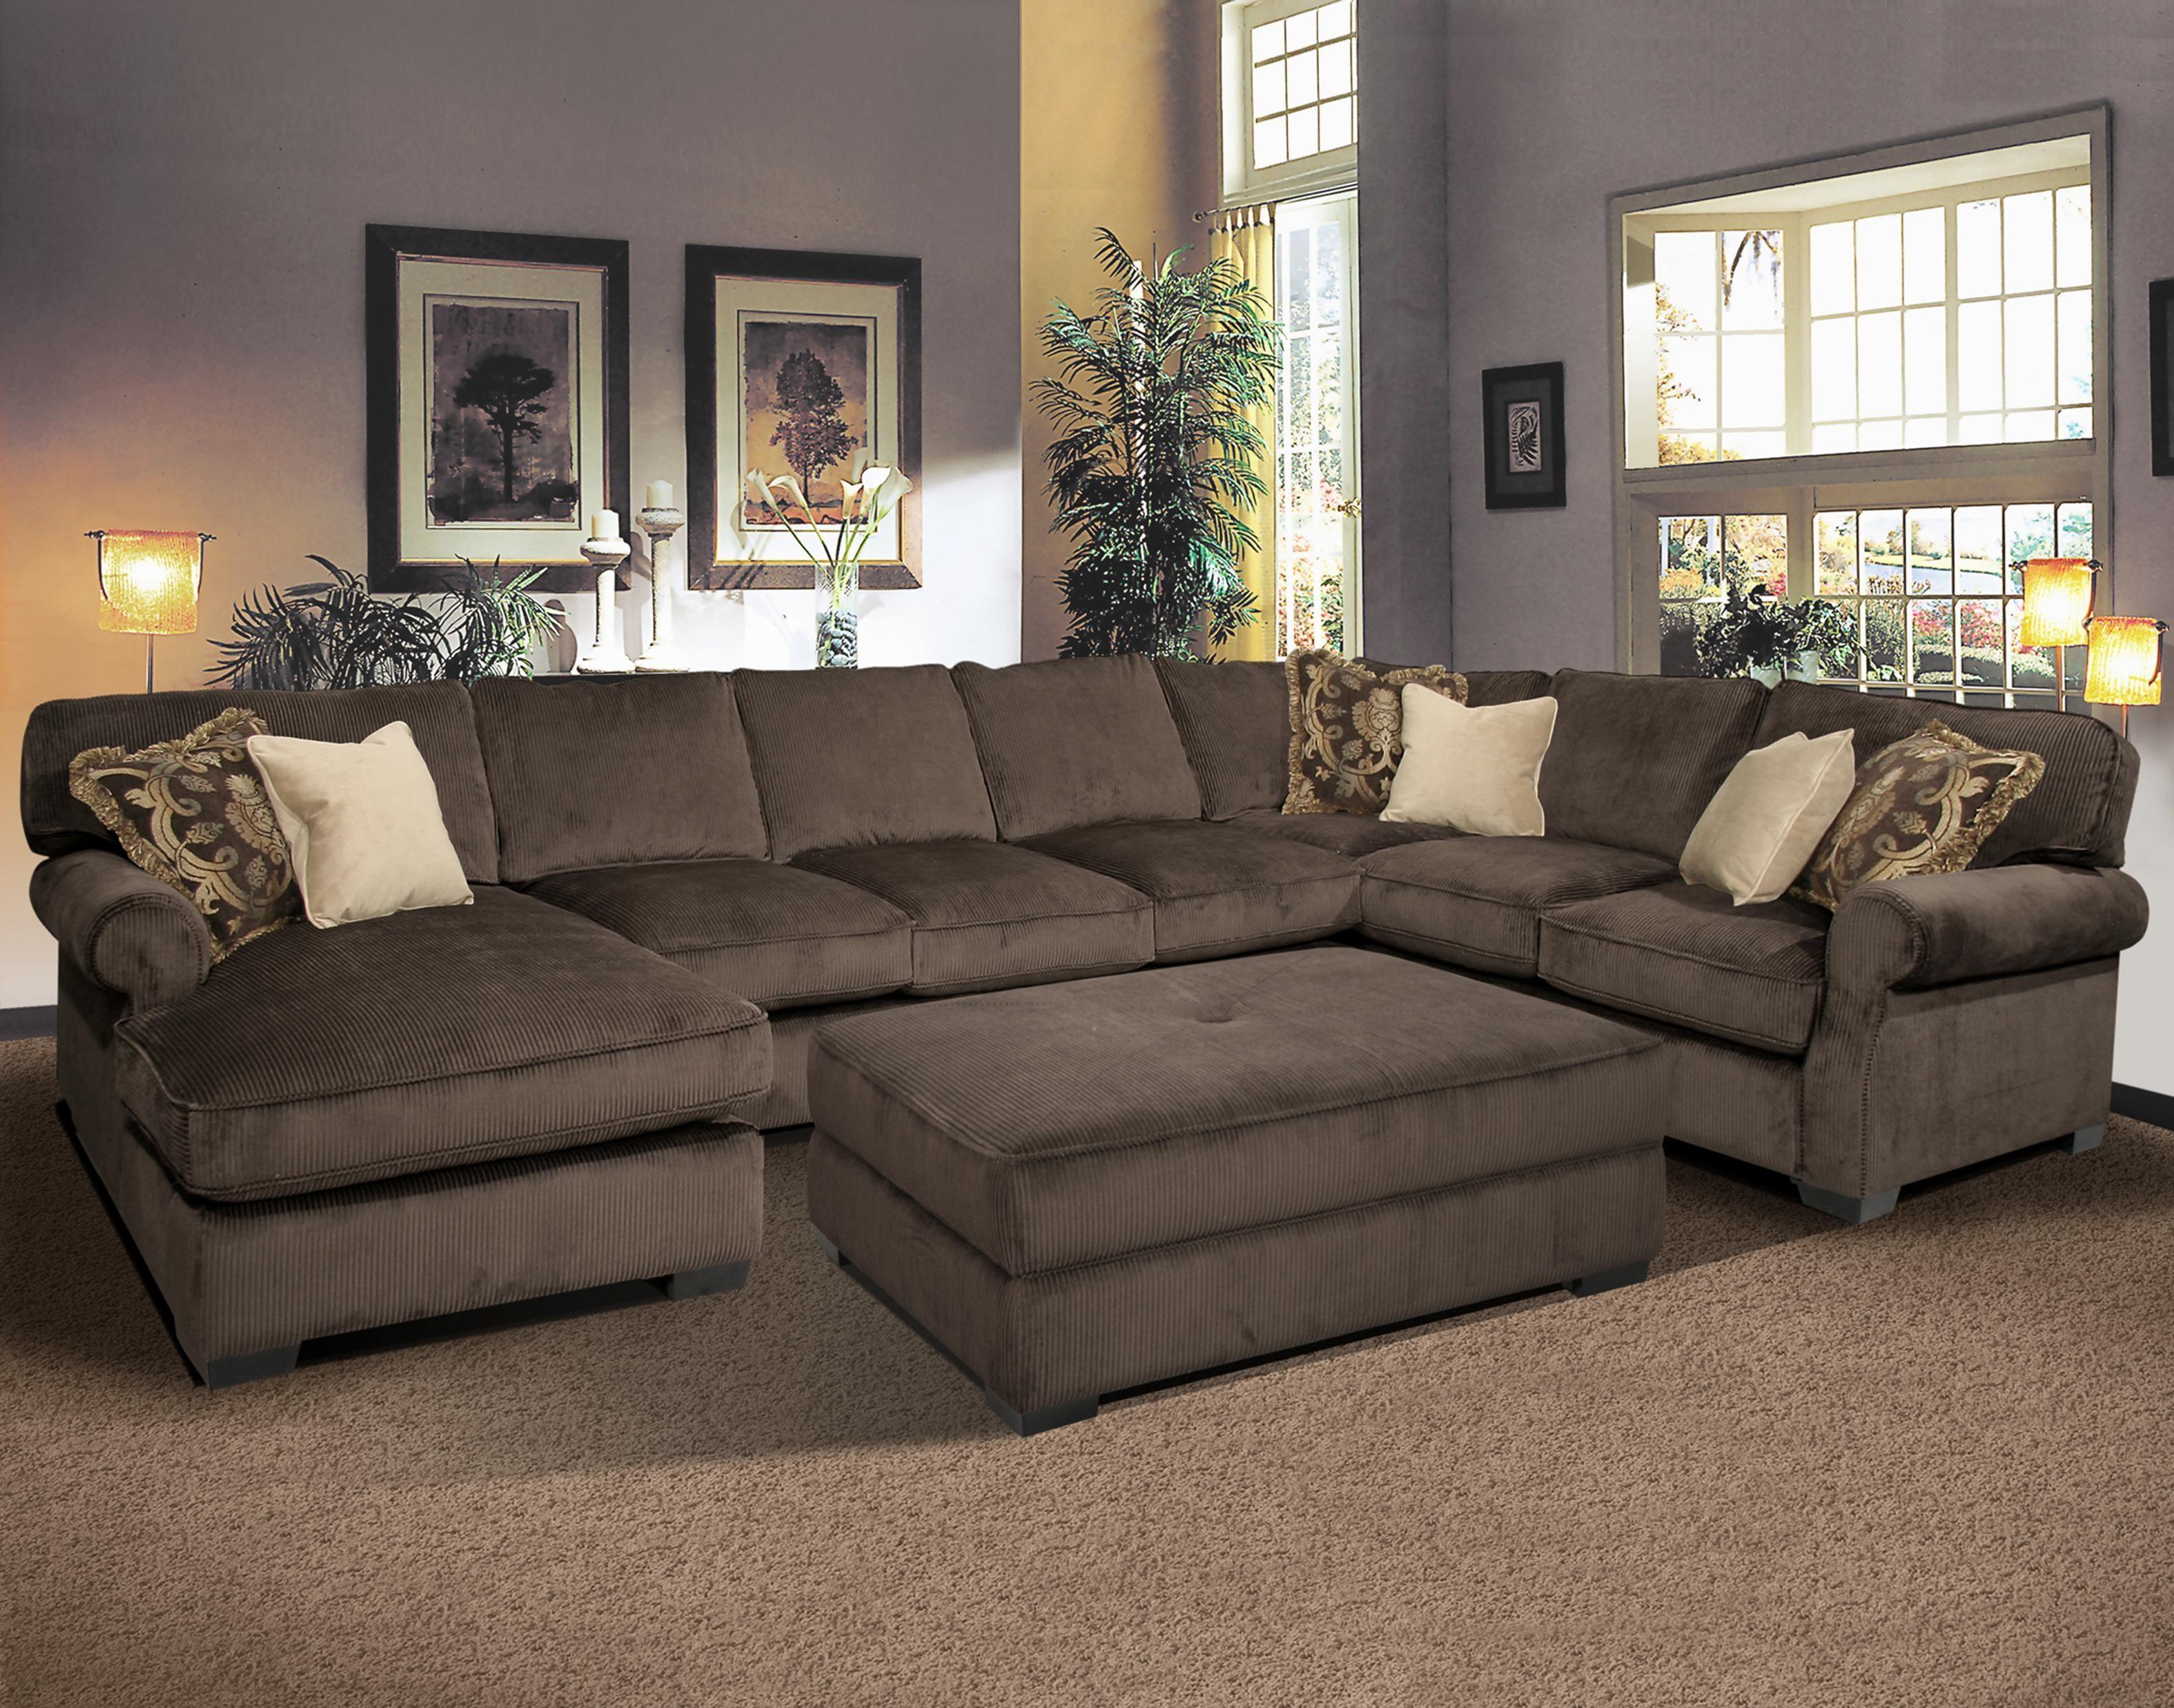 Furniture: Star Furniture San Antonio Tx | Leather Sofa Houston For Houston Sectional Sofa (Image 3 of 20)